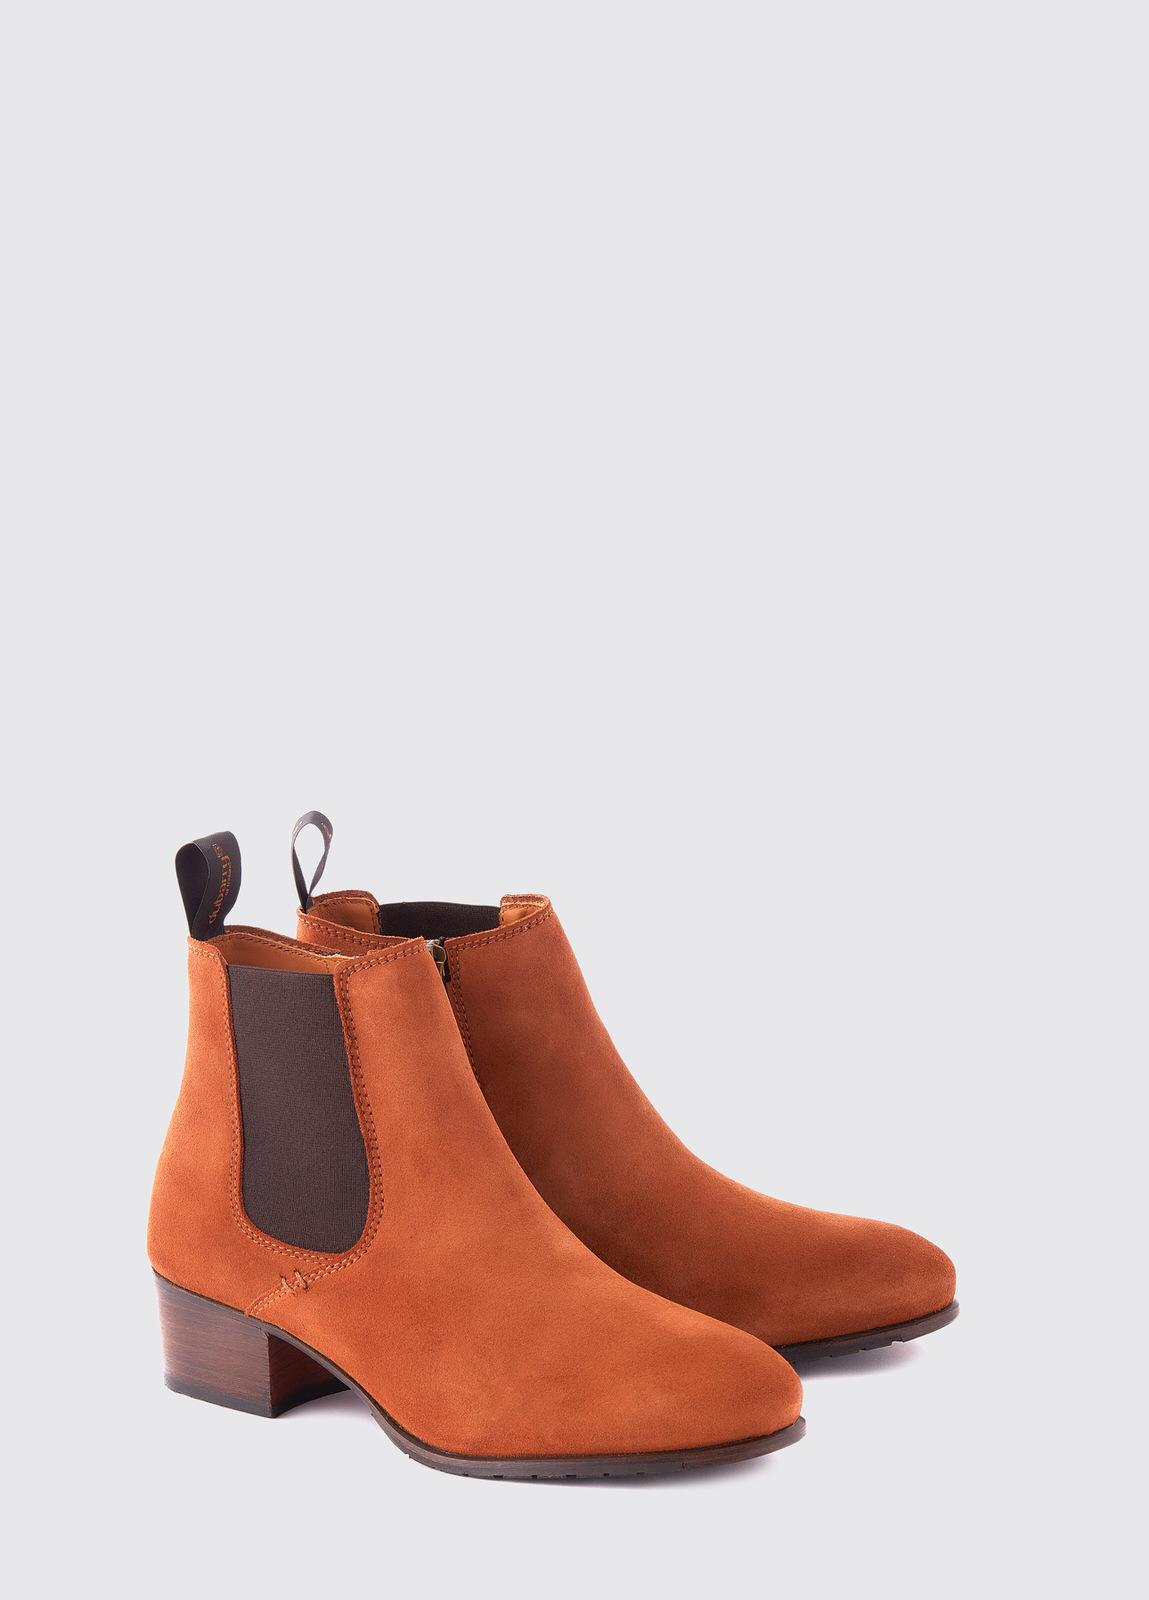 Bray Chelsea Boot - Camel